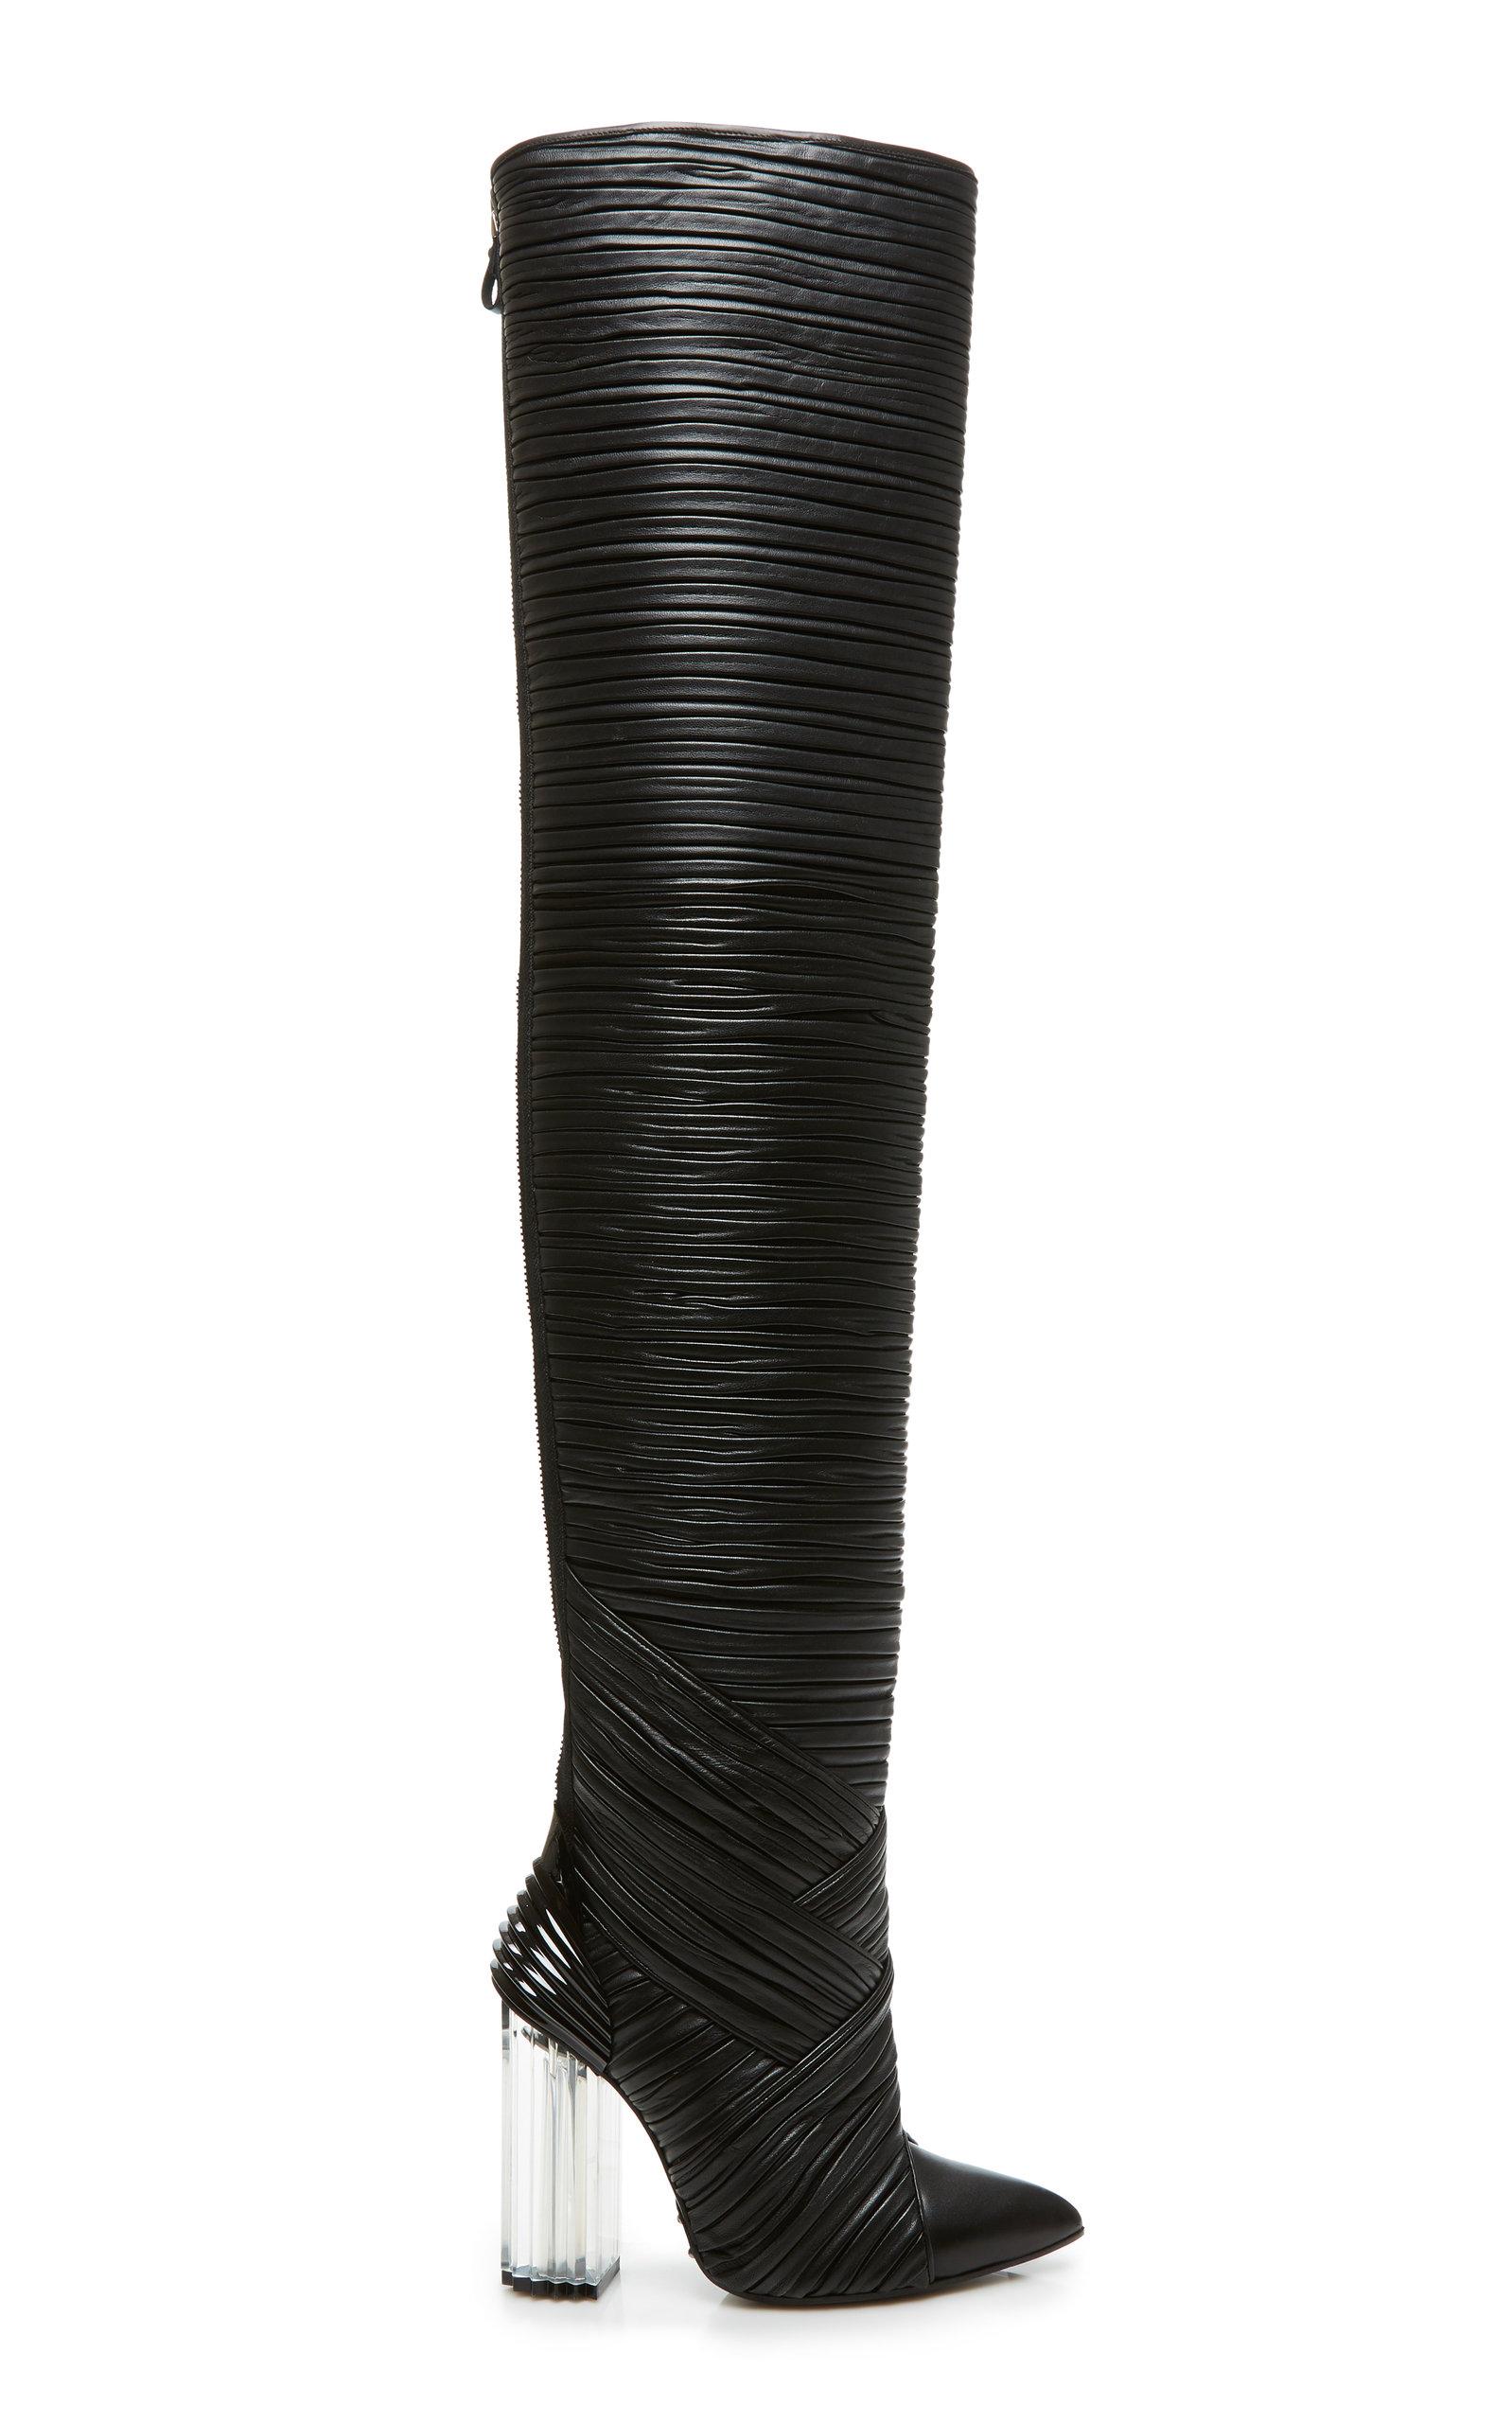 32b2de1cb7b Shop Balmain Ingrid Over The Knee Boot In Black